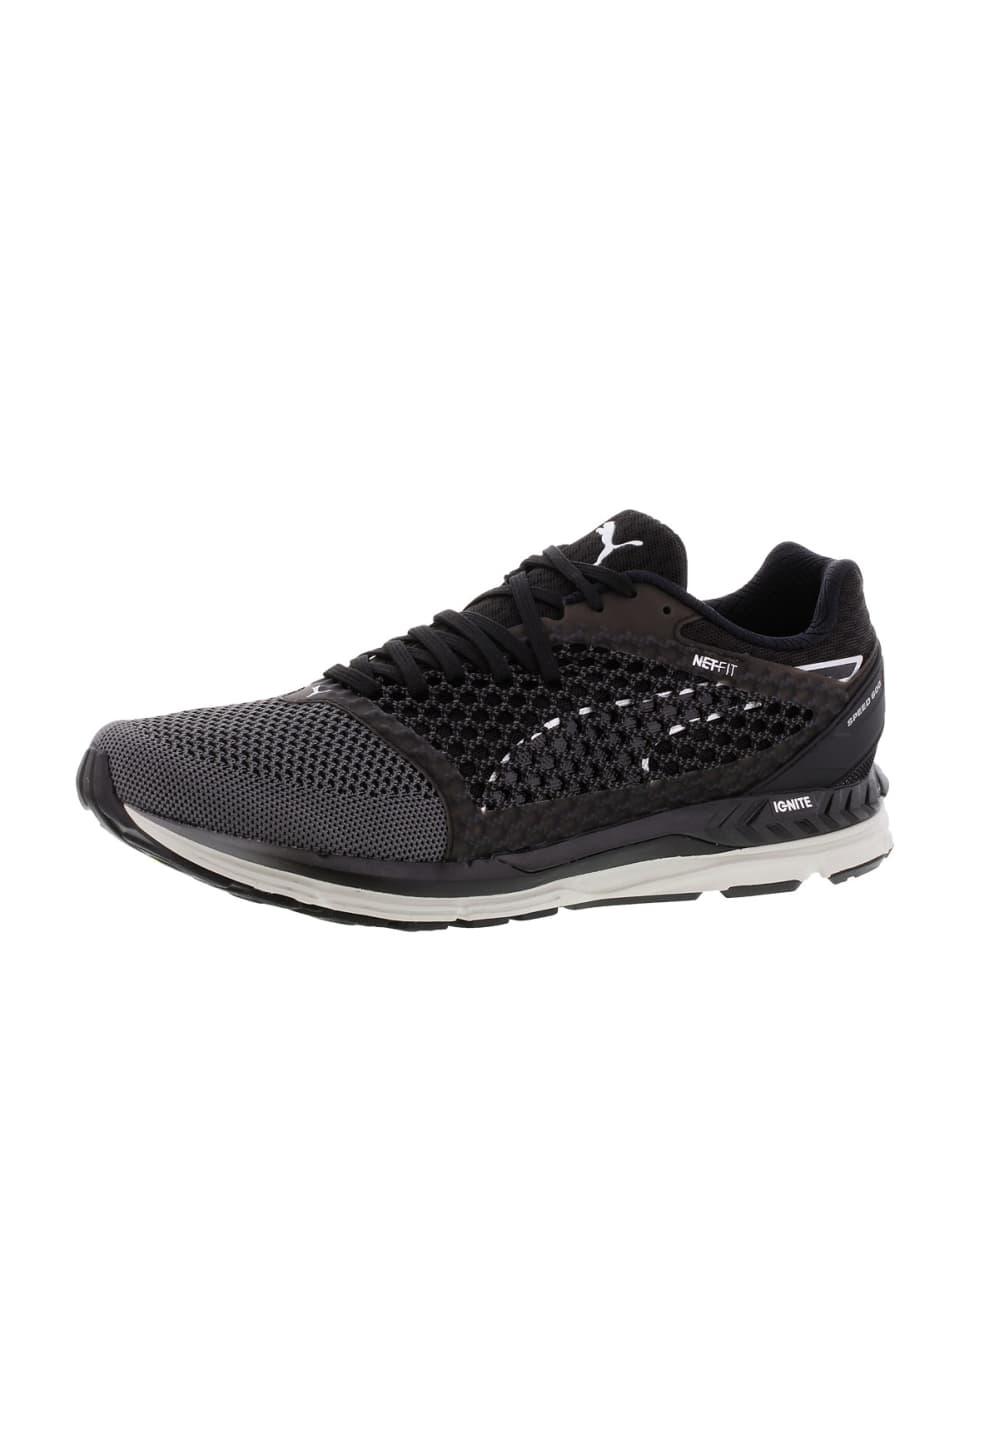 92aeca2eed16 Puma Speed 600 Ignite 3 - Running shoes for Men - Black